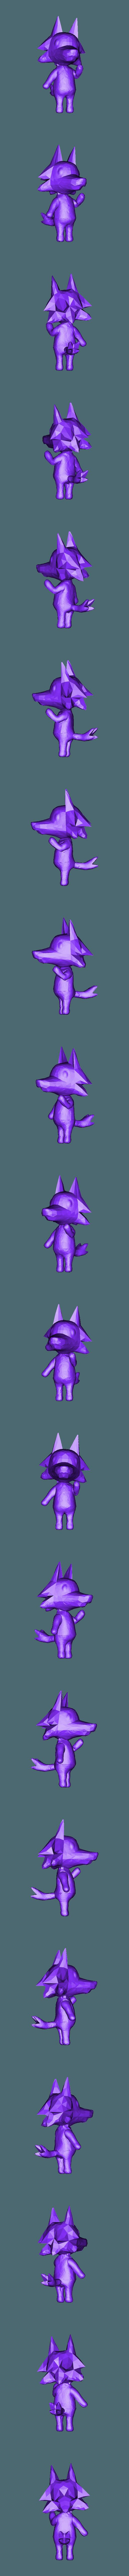 CE2_skye5.stl Download free OBJ file Animal Crossing Wolf • 3D printer design, skelei